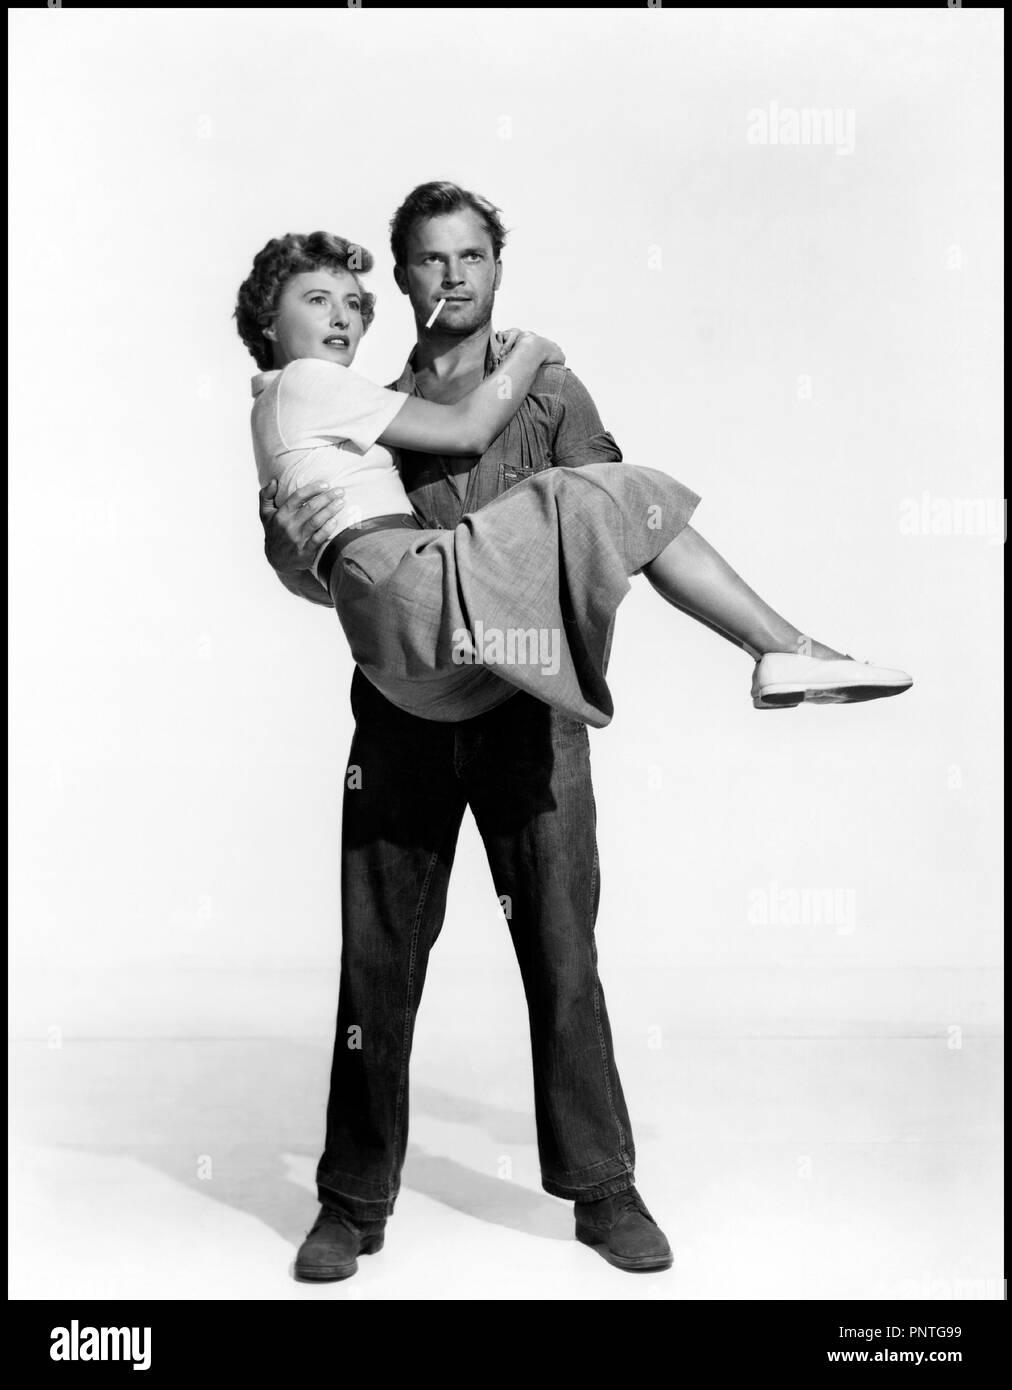 Prod DB © Loew's Inc. - Metro-Goldwyn-Mayer / DR LA PLAGE DESERTE (JEOPARDY) de John Sturges 1953 USA avec Barbara Stanwyck et Ralph Meeker  couple, porter, cigarette, pose, film noir code MGM: 1594 - Stock Image